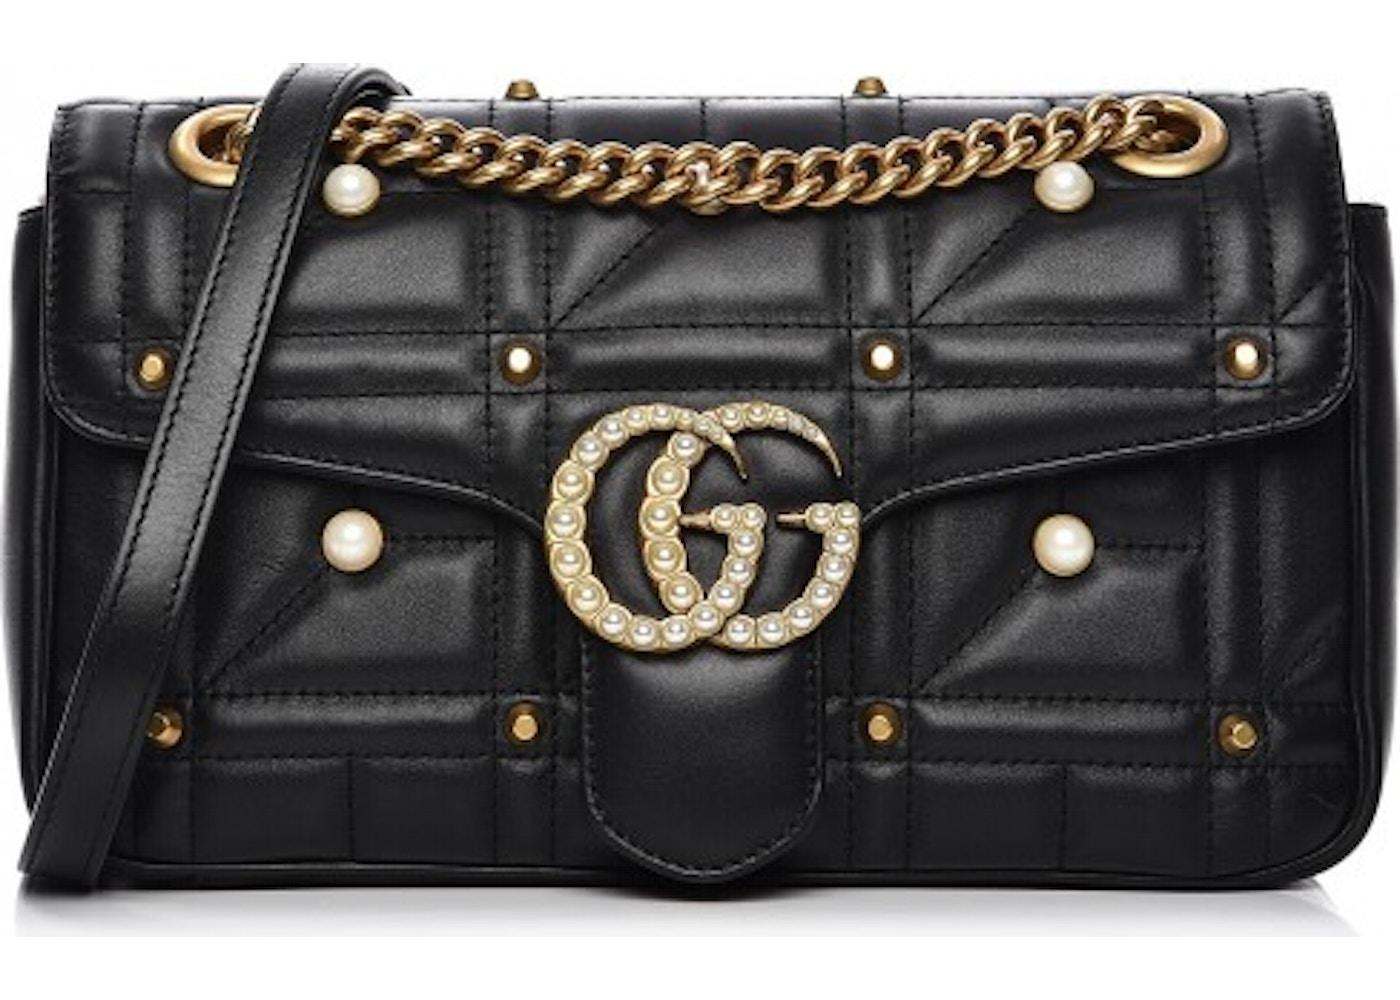 3af0b8cfa Gucci Marmont Shoulder Matelasse GG Pearl Studded Small Black. Matelasse GG  Pearl Studded Small Black